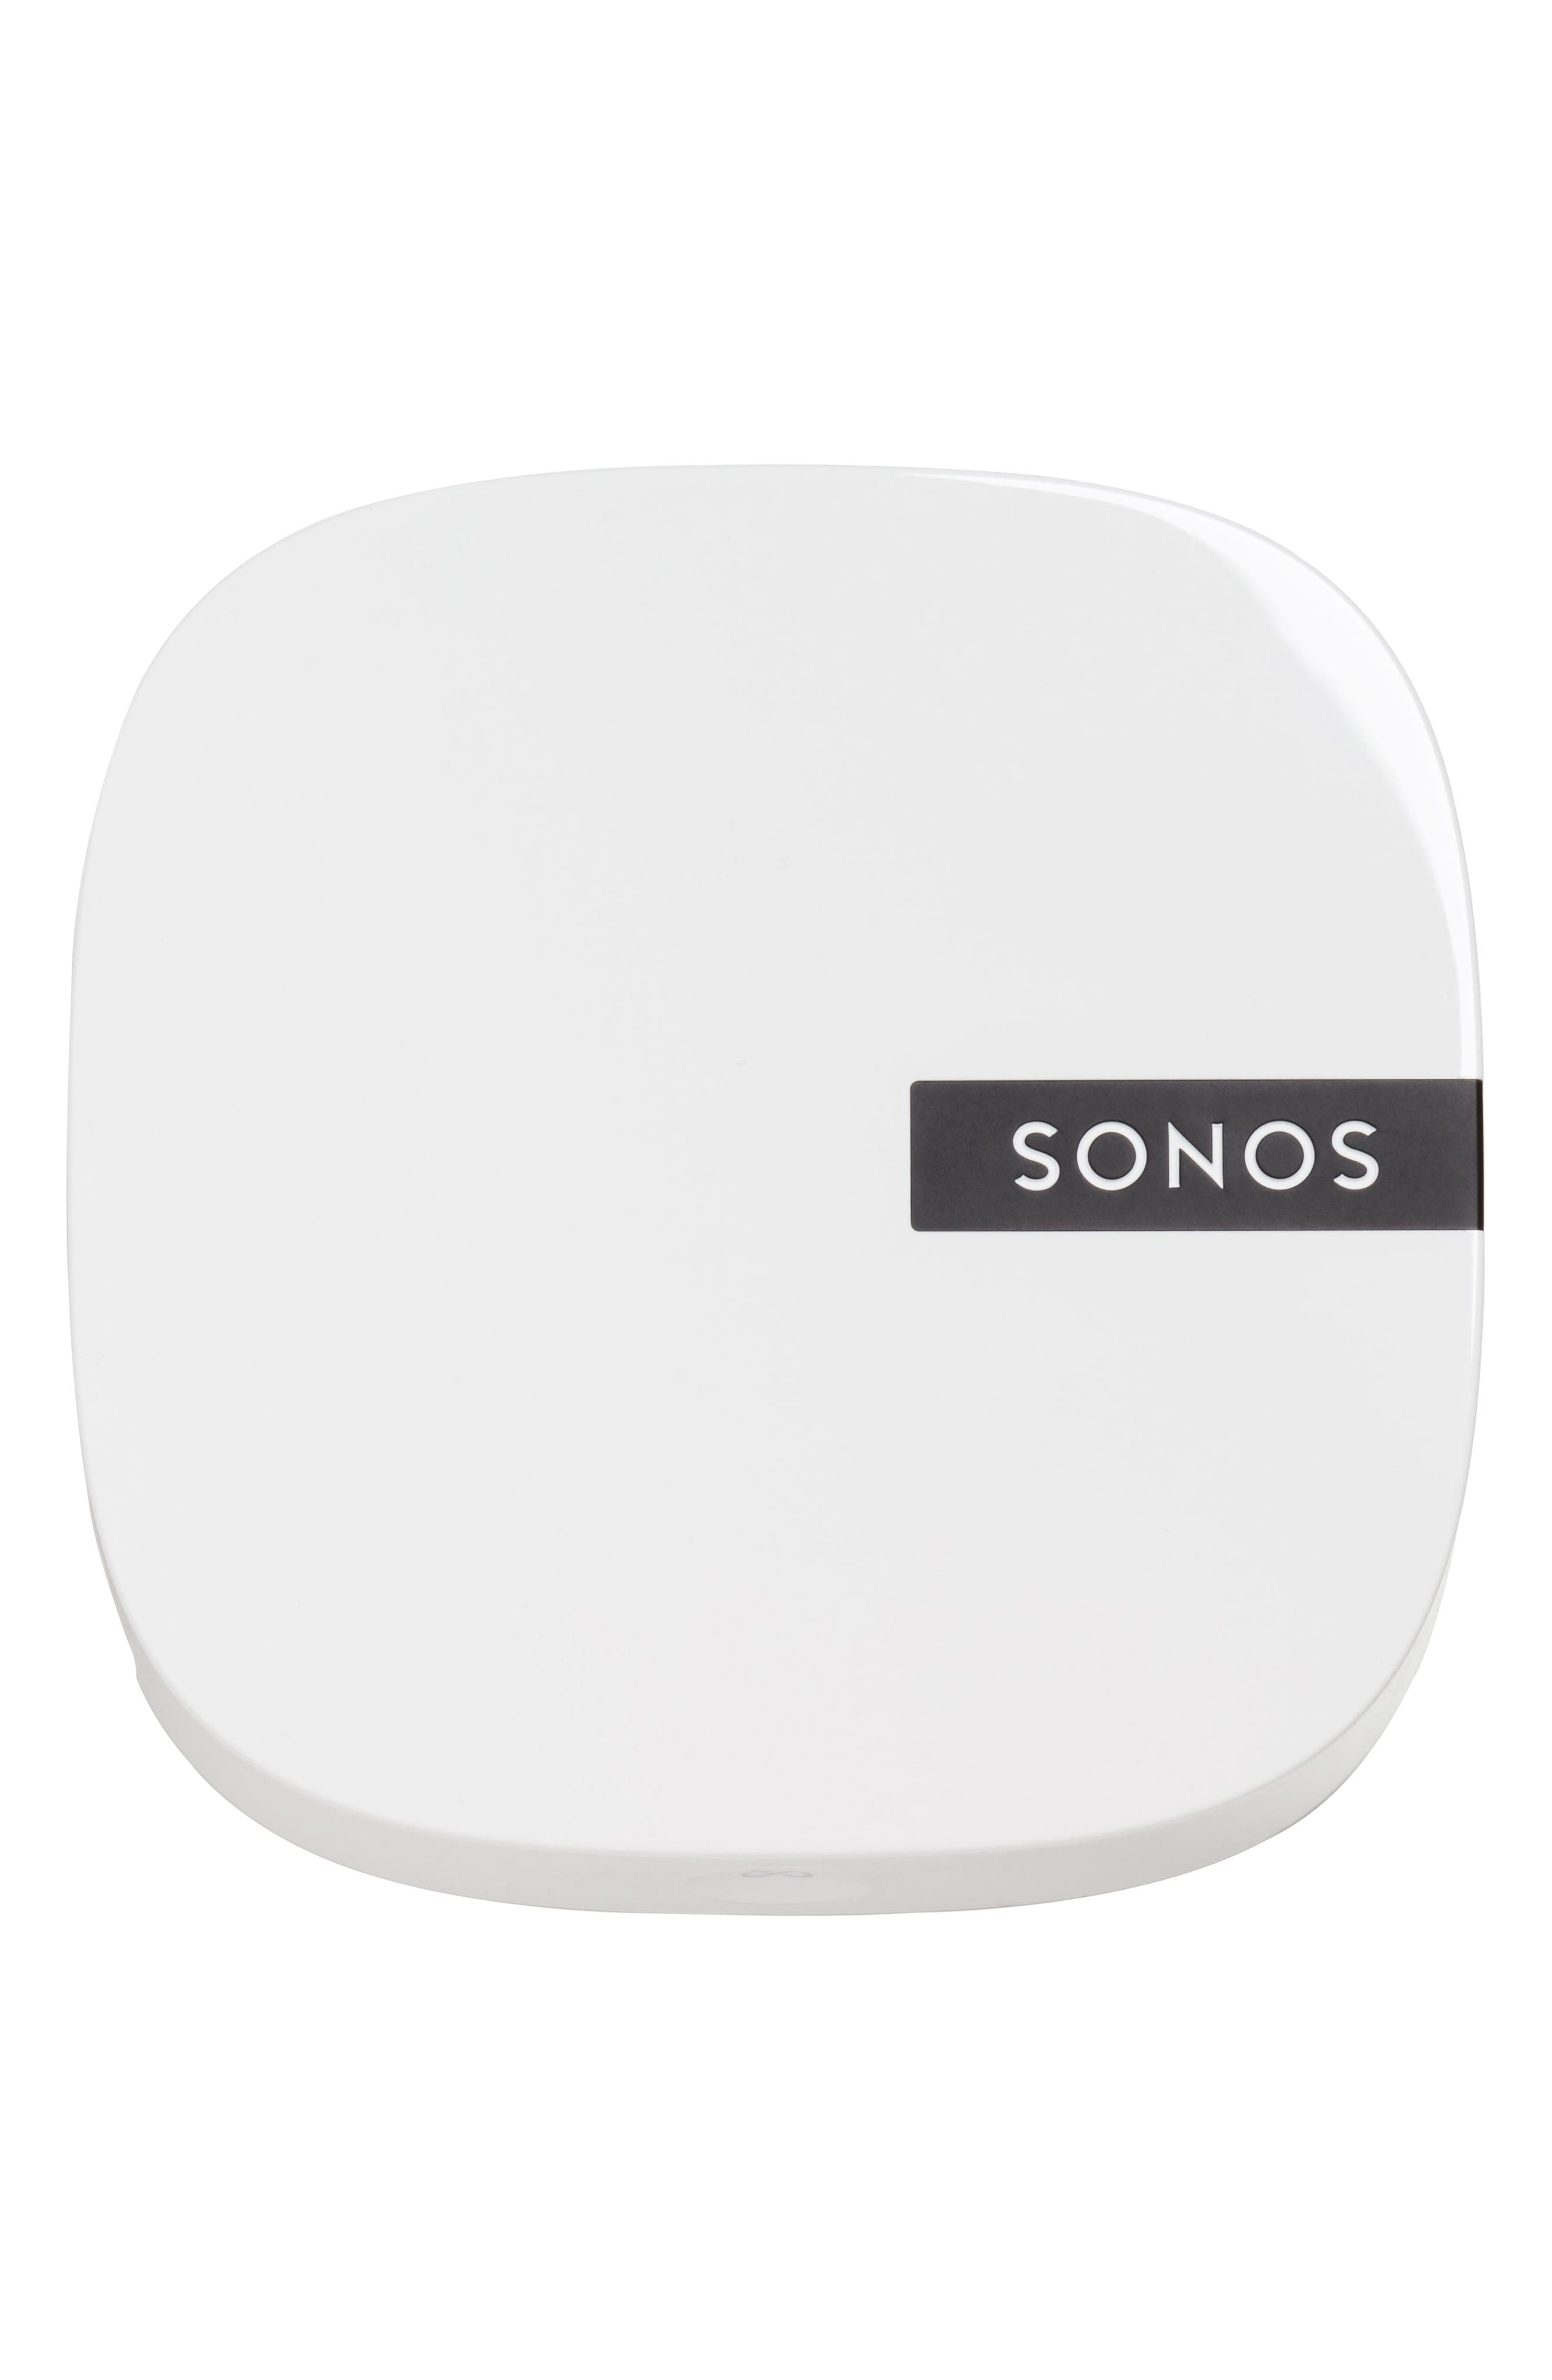 Sonos BOOST Wi-Fi Signal Booster